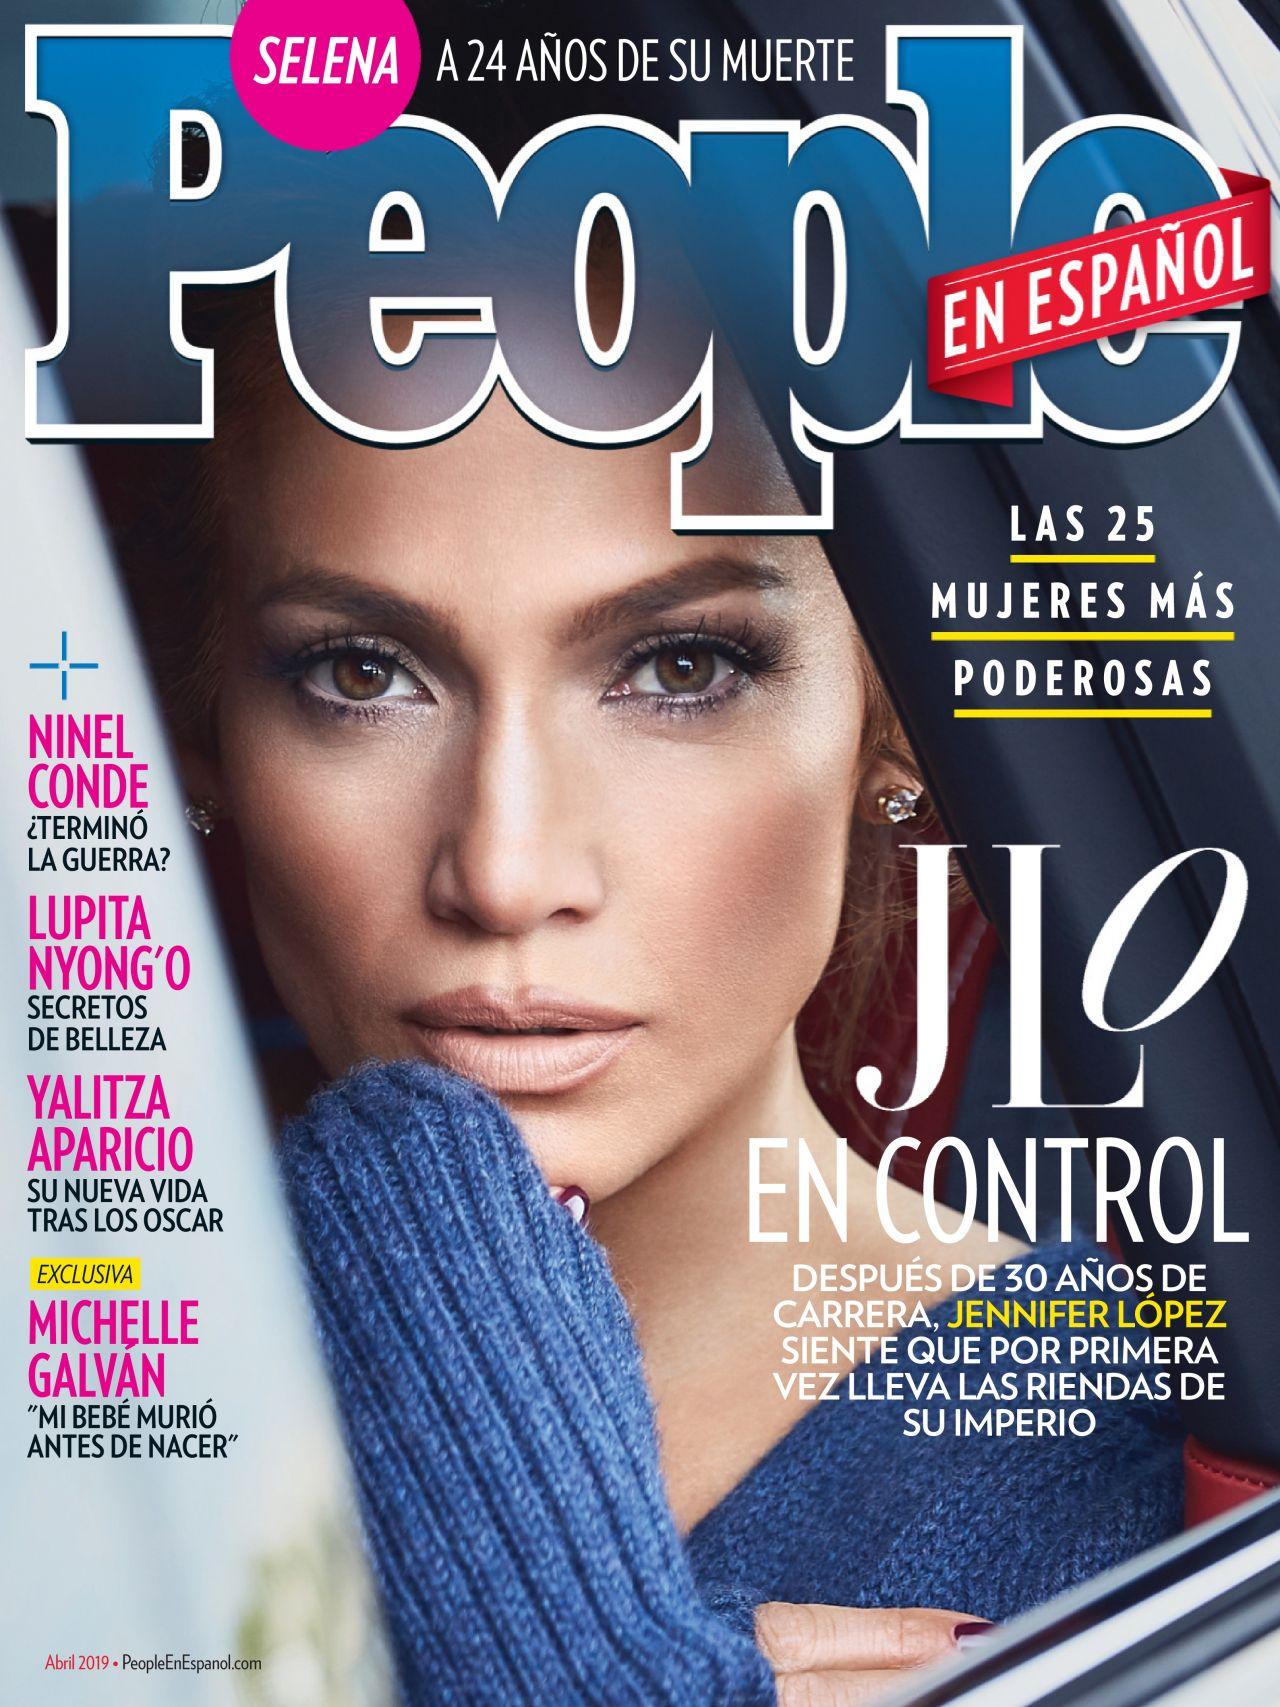 april jennifer lopez espanol cover most spain magazines peoples influential baez nicaraguan picky daisy among spanish hawtcelebs celeste